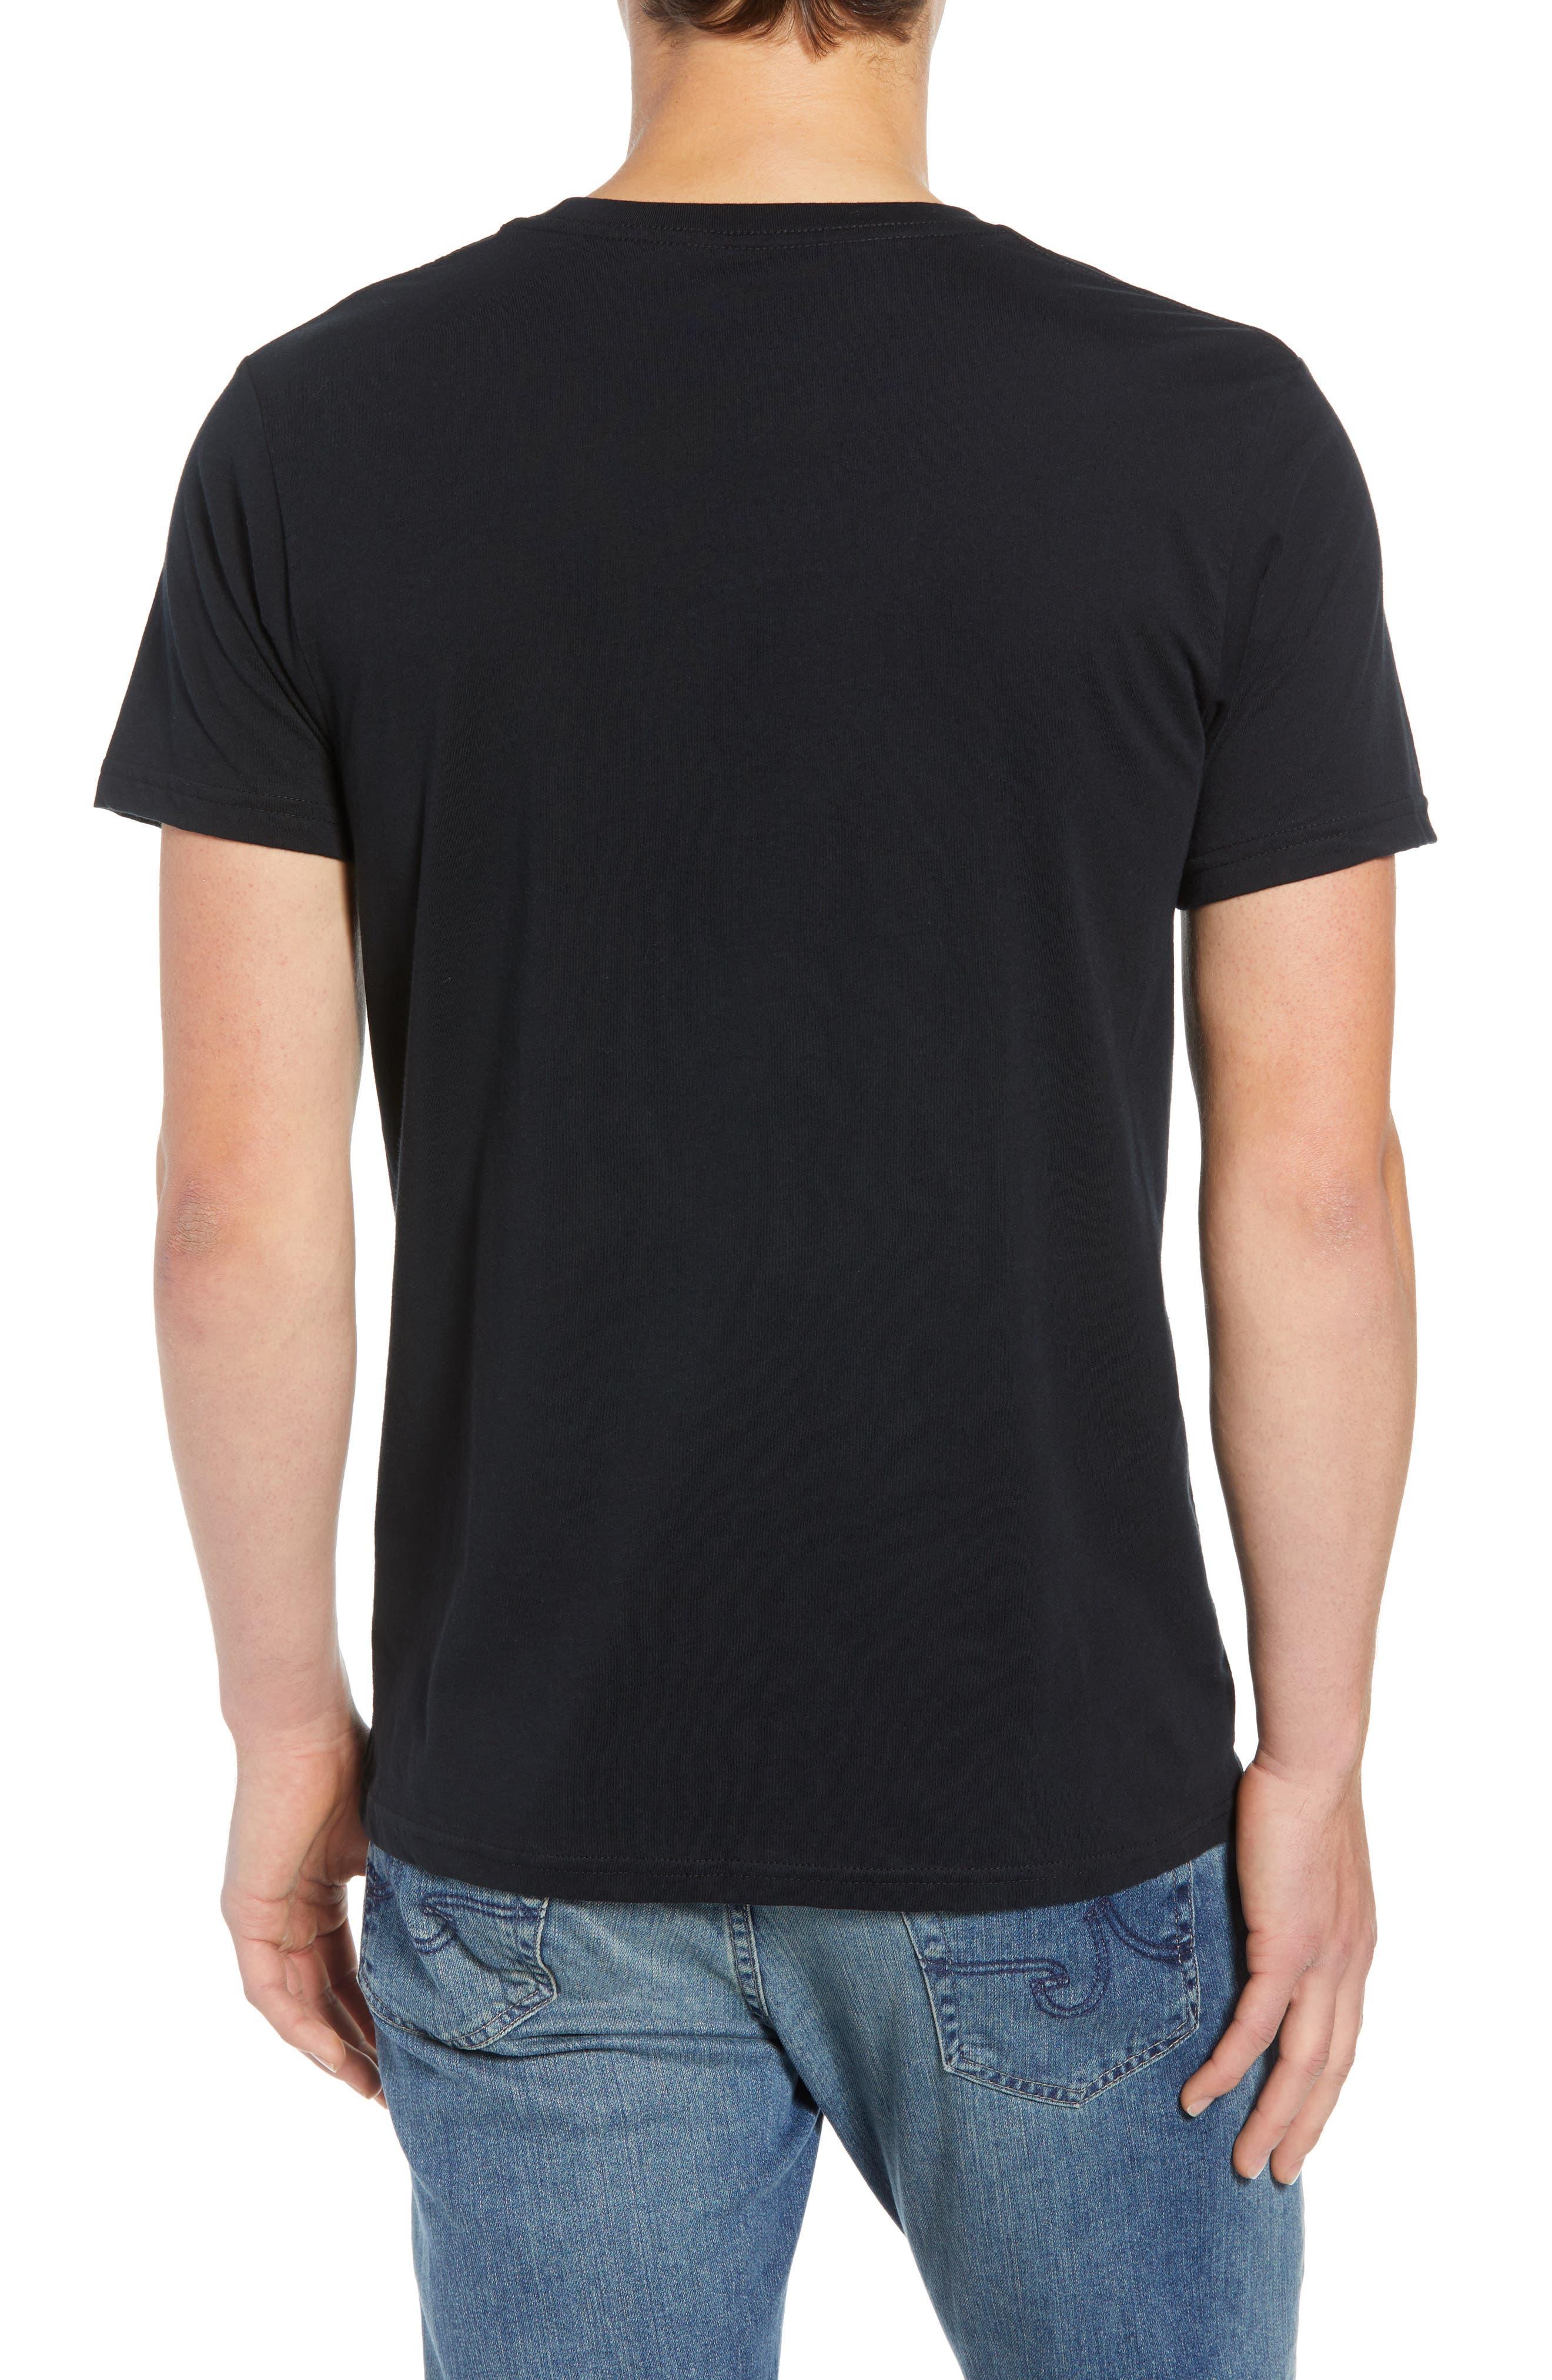 Flying Fish Organic Cotton T-Shirt,                             Alternate thumbnail 2, color,                             BLACK/ ALBANIAN LANDSCAPE